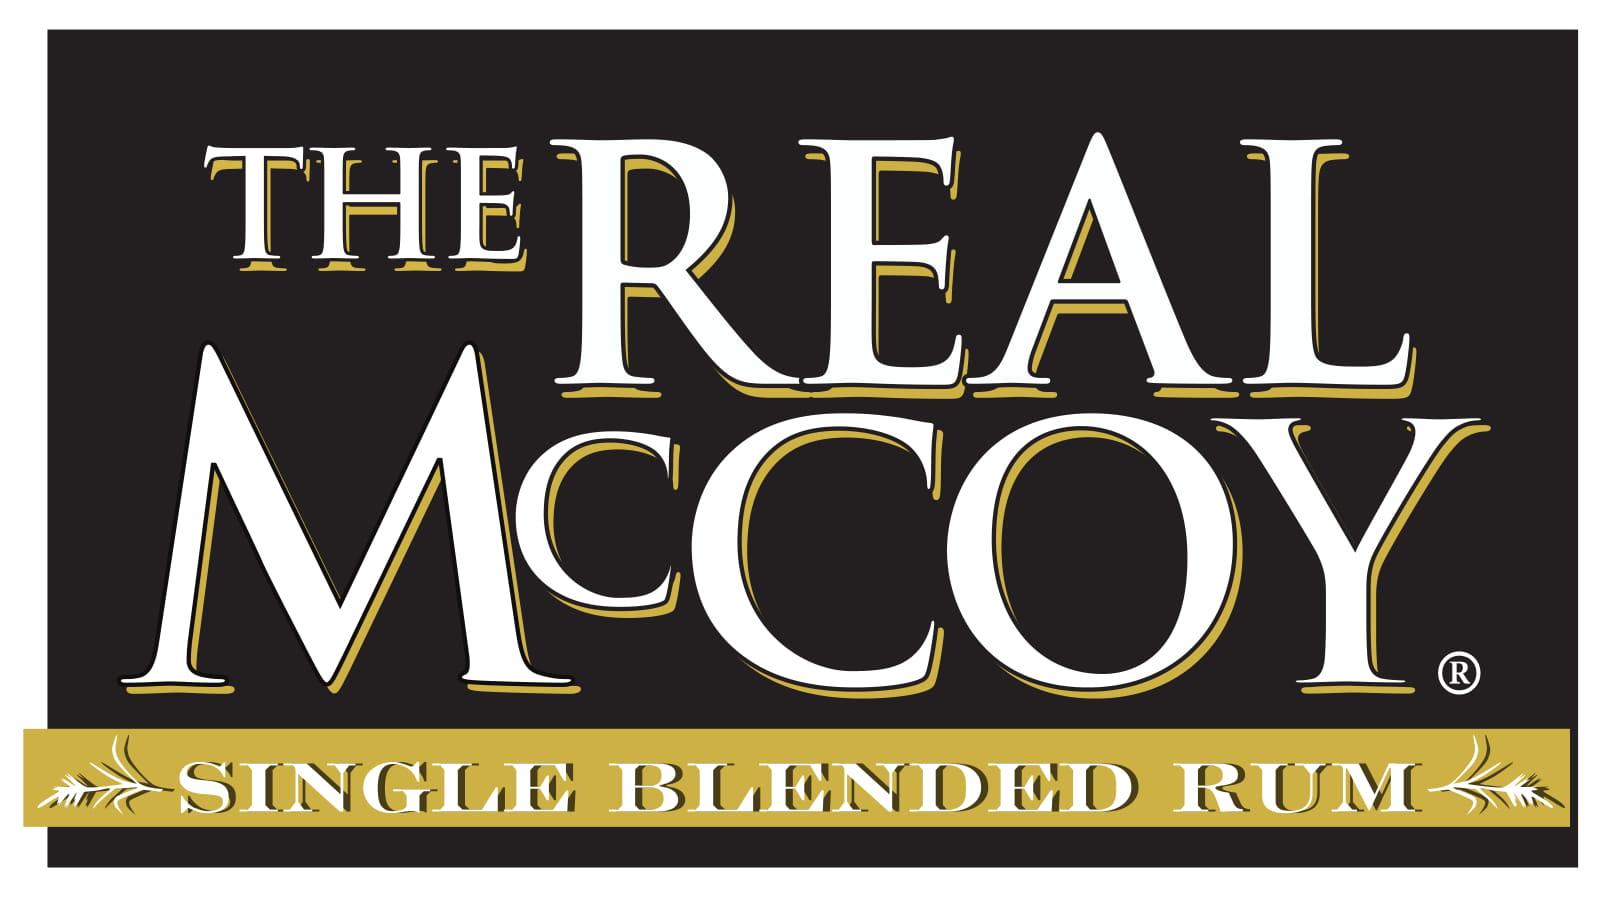 TheRealMcCoy®_Color_SingleBlendedRum_Logo_BlackRectangle_DropShadow_AI copy-1.jpg